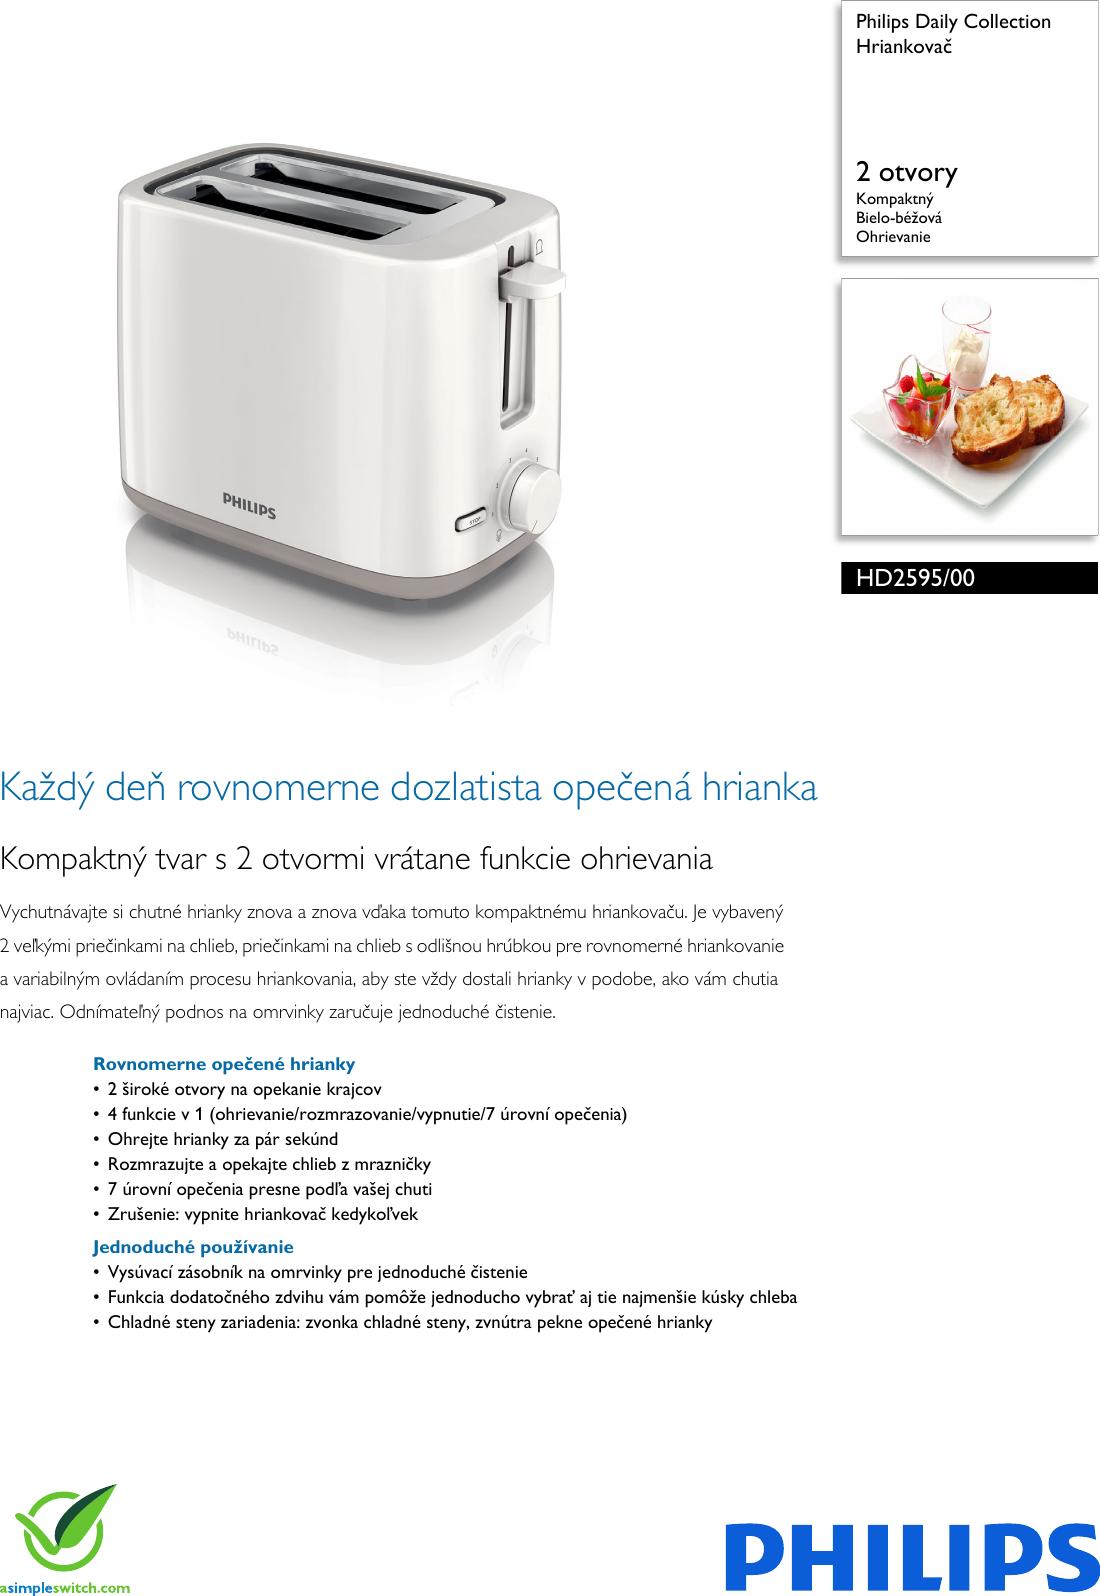 6d7c260c4 Philips Leaflet HD2595_00 Released Slovakia (Slovak) . ... Hd2595 00 Pss  Slksk